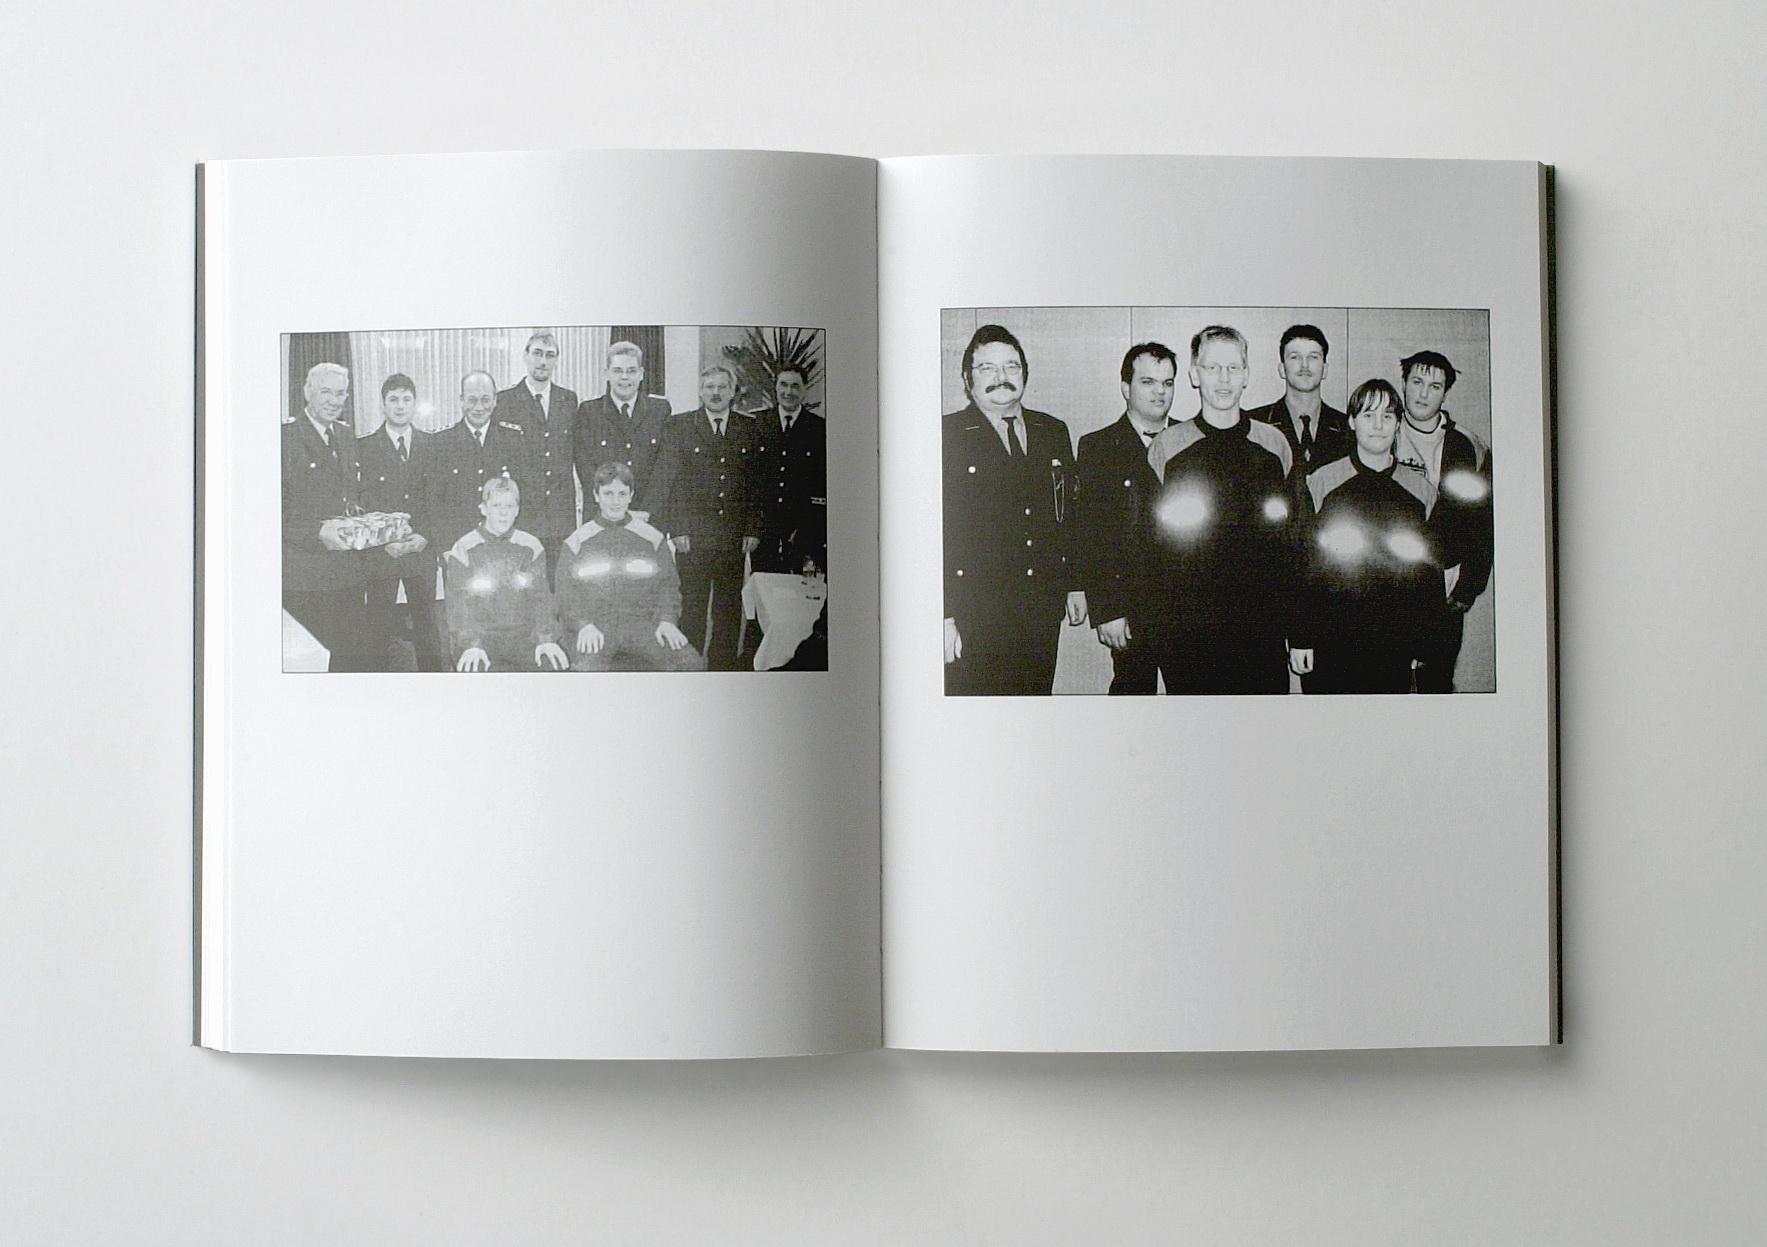 | Archiv Peter Piller Bd. 7: Regionales Leuchten | ProjecteSD